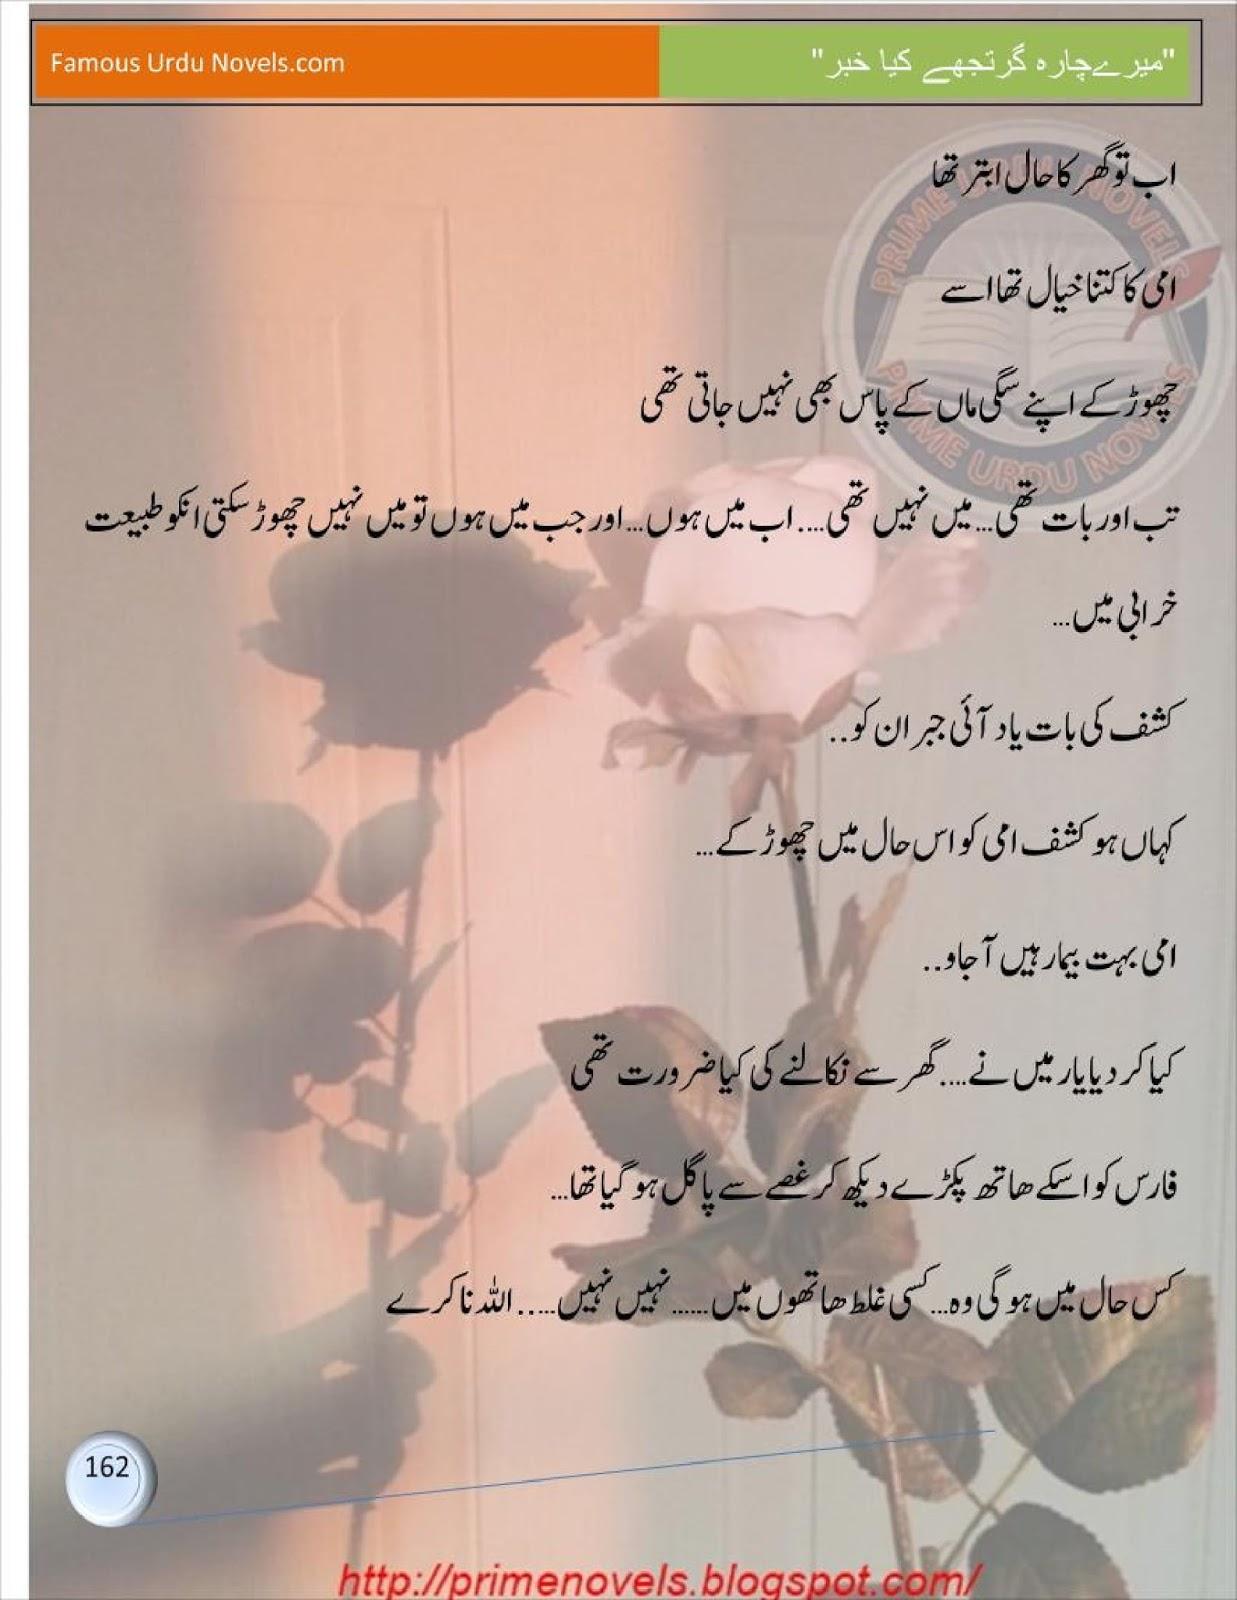 Summary -> Famous Urdu Novels Urdu Novels List